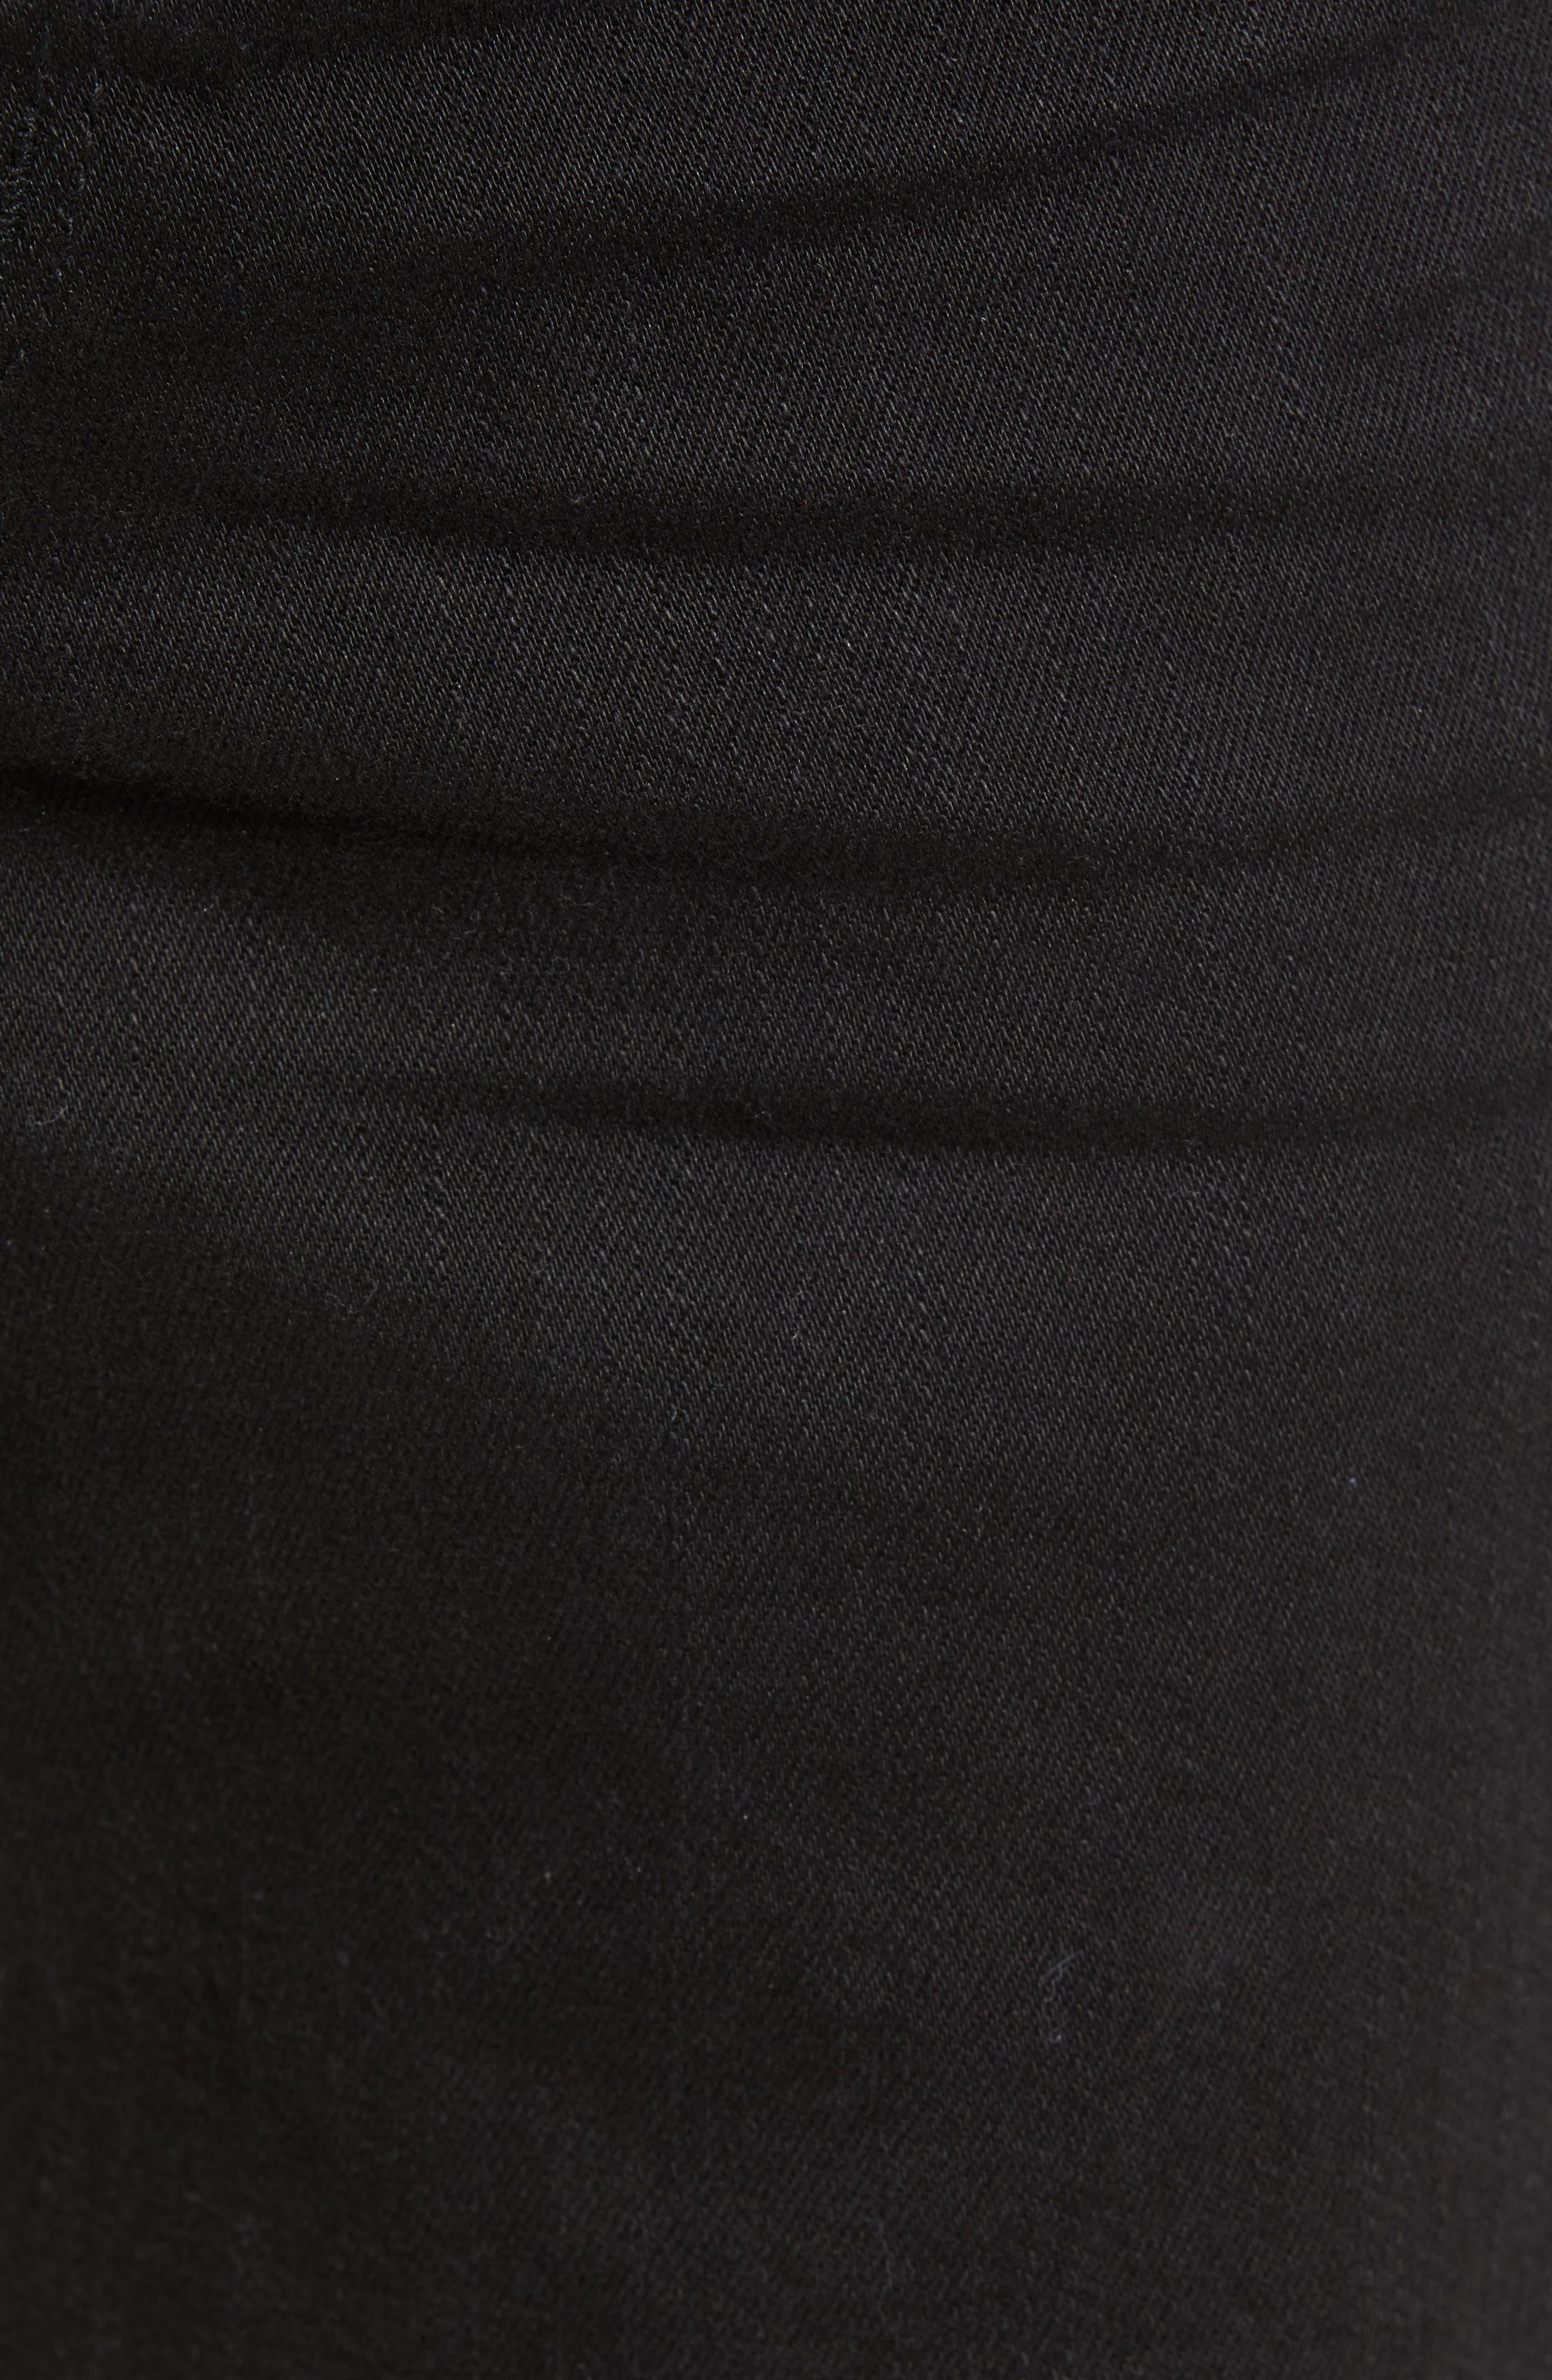 Ripped Skinny Jeans,                             Alternate thumbnail 5, color,                             BLACK STONE WASH